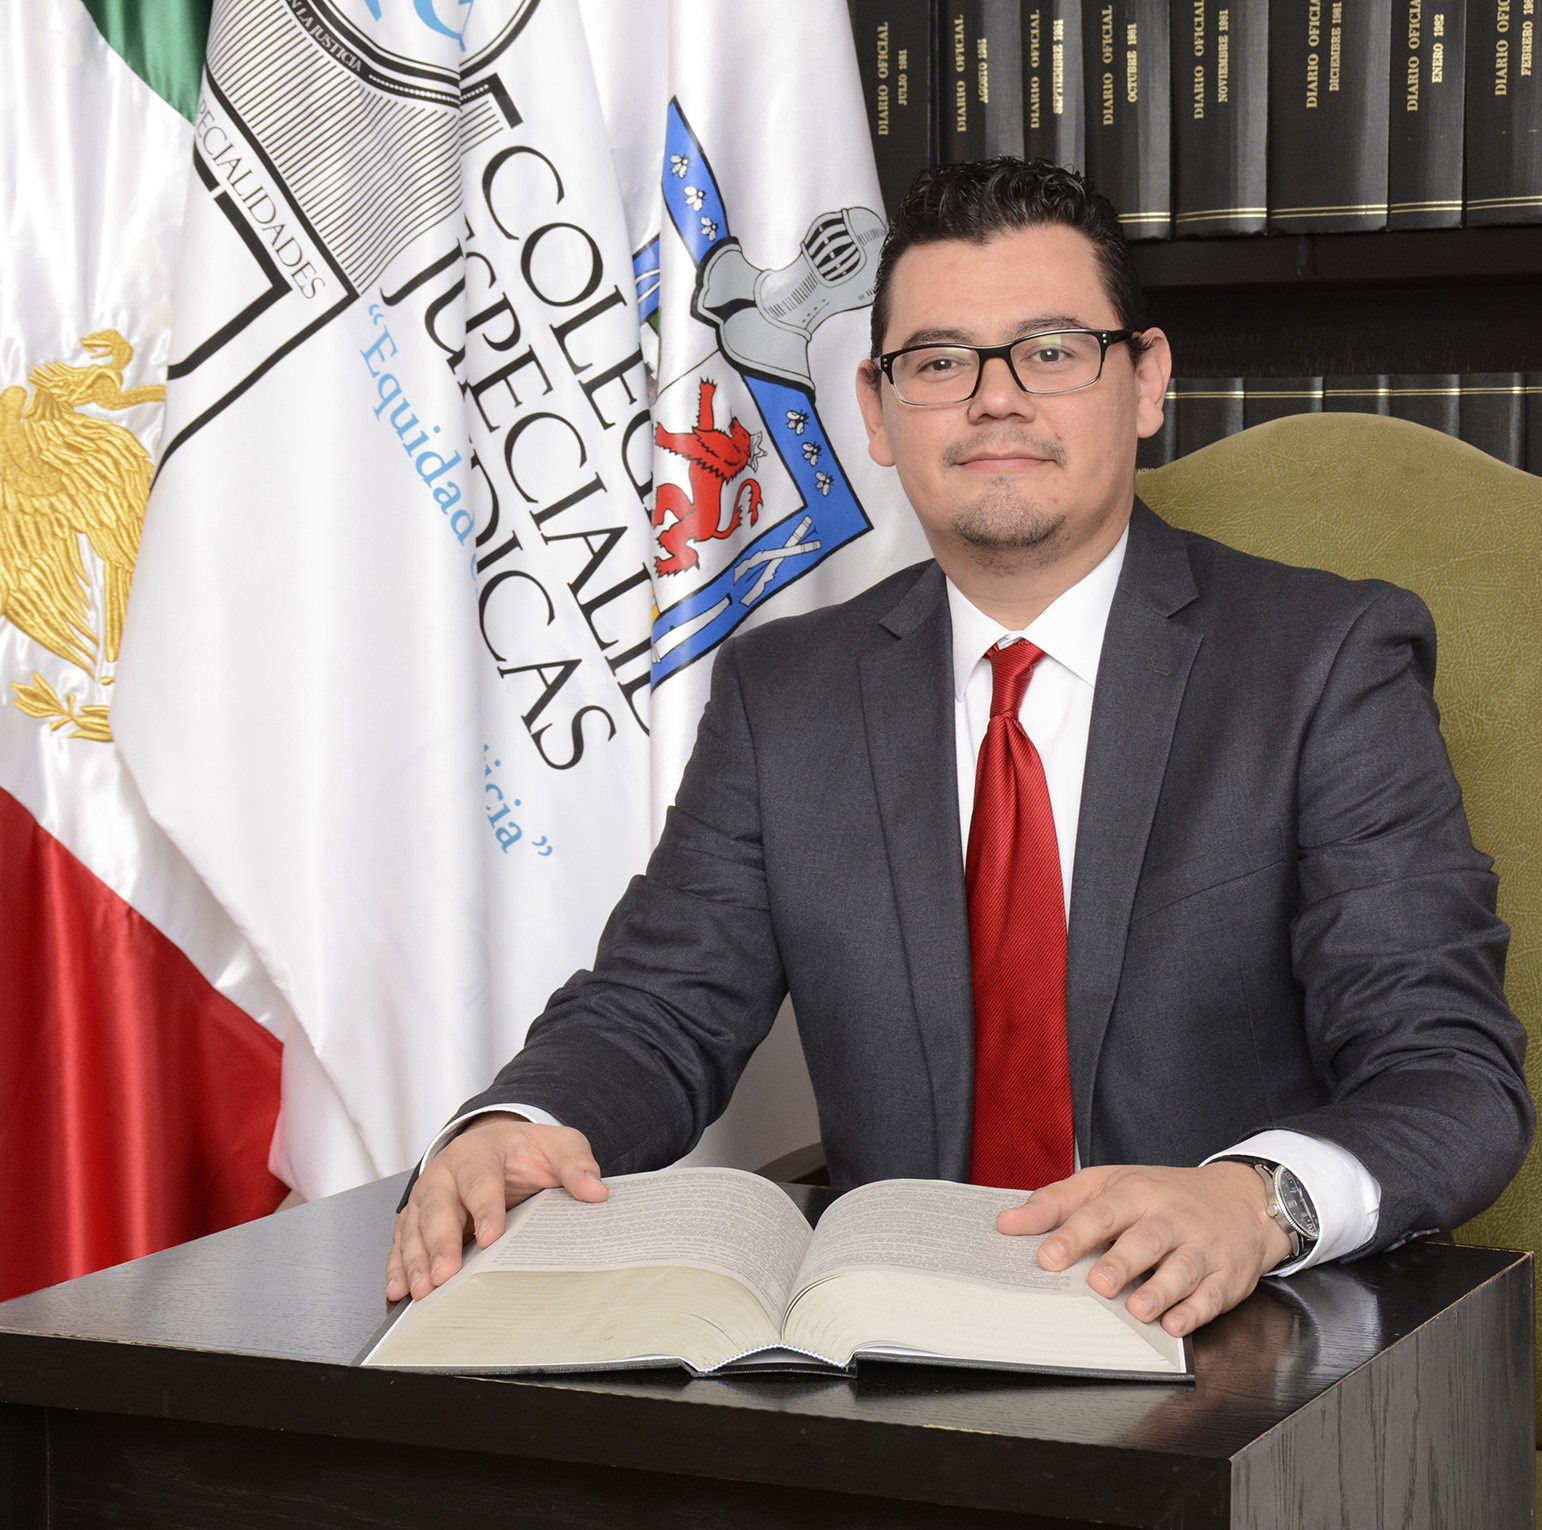 Lic. Alberto Sandoval